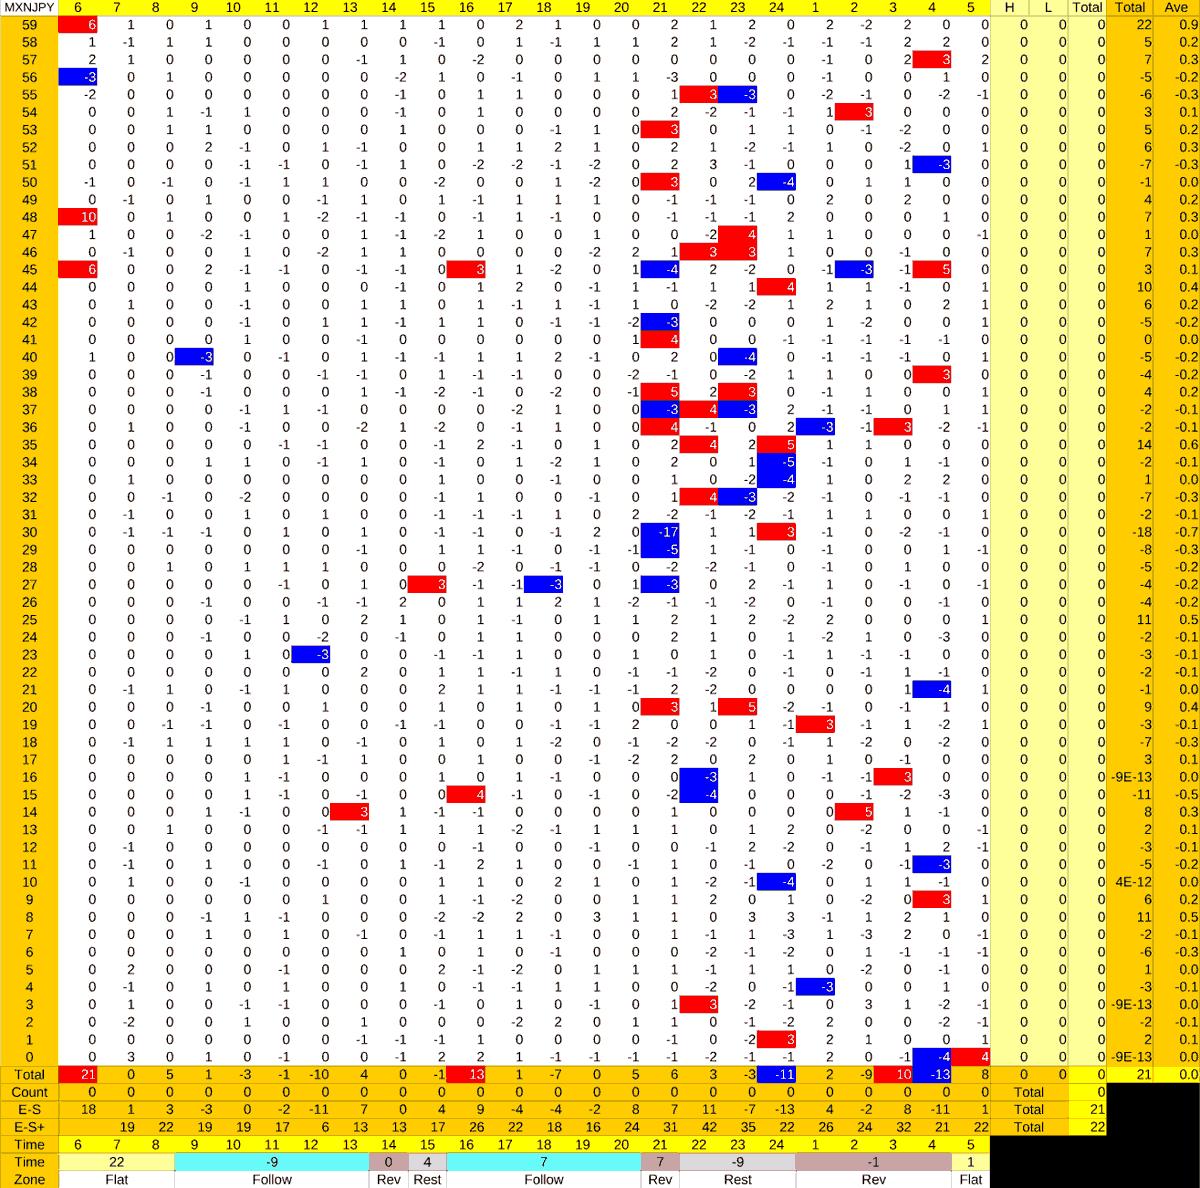 20210512_HS(3)MXNJPY